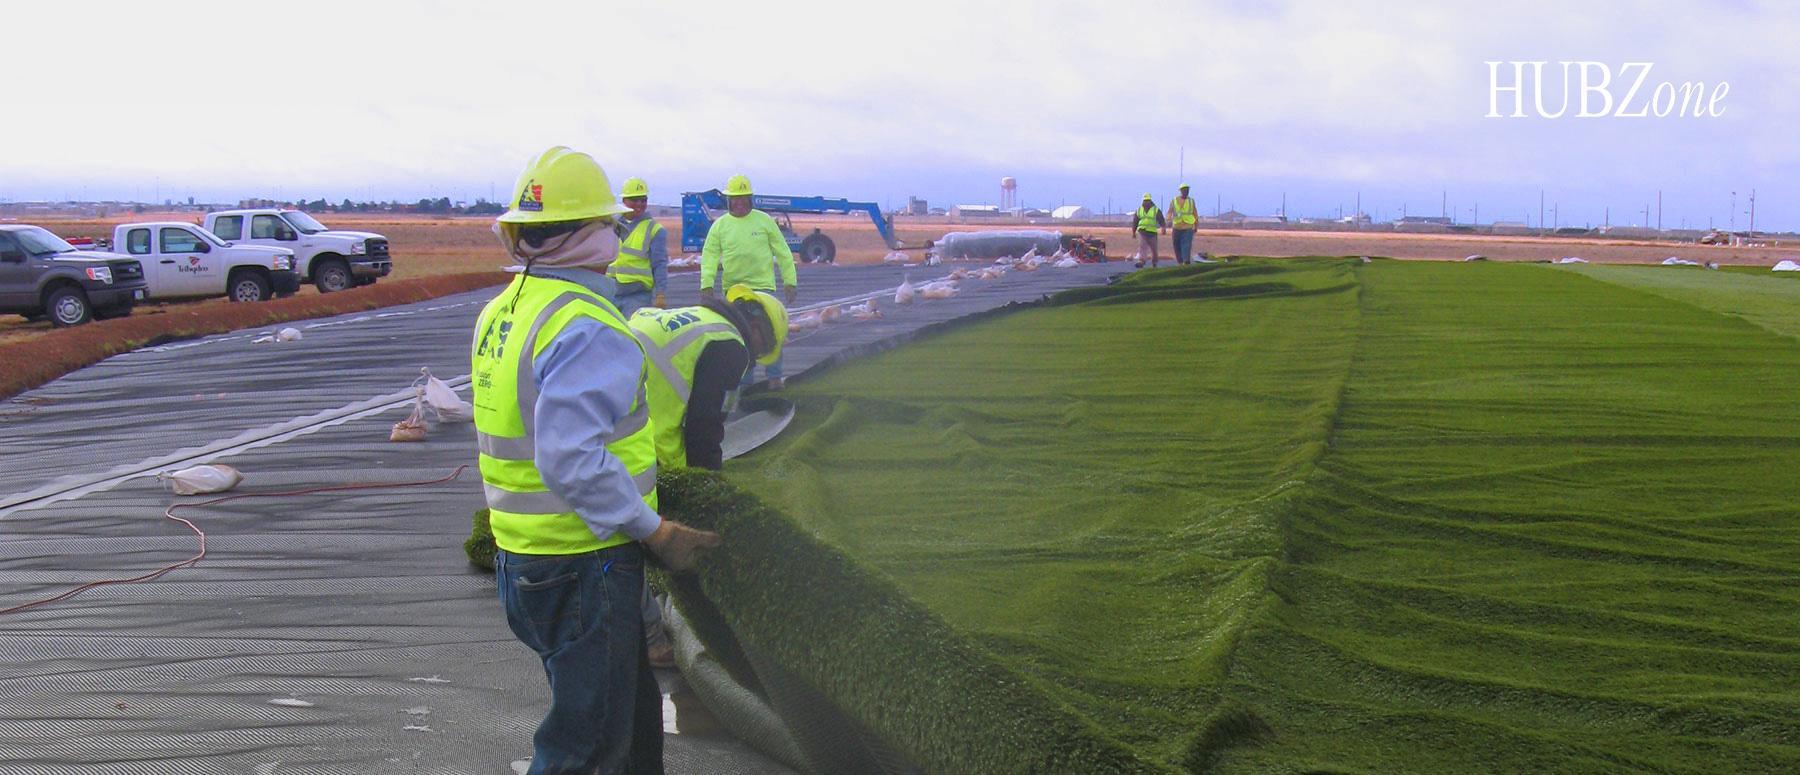 DOE Engineering Environmental HUBZone